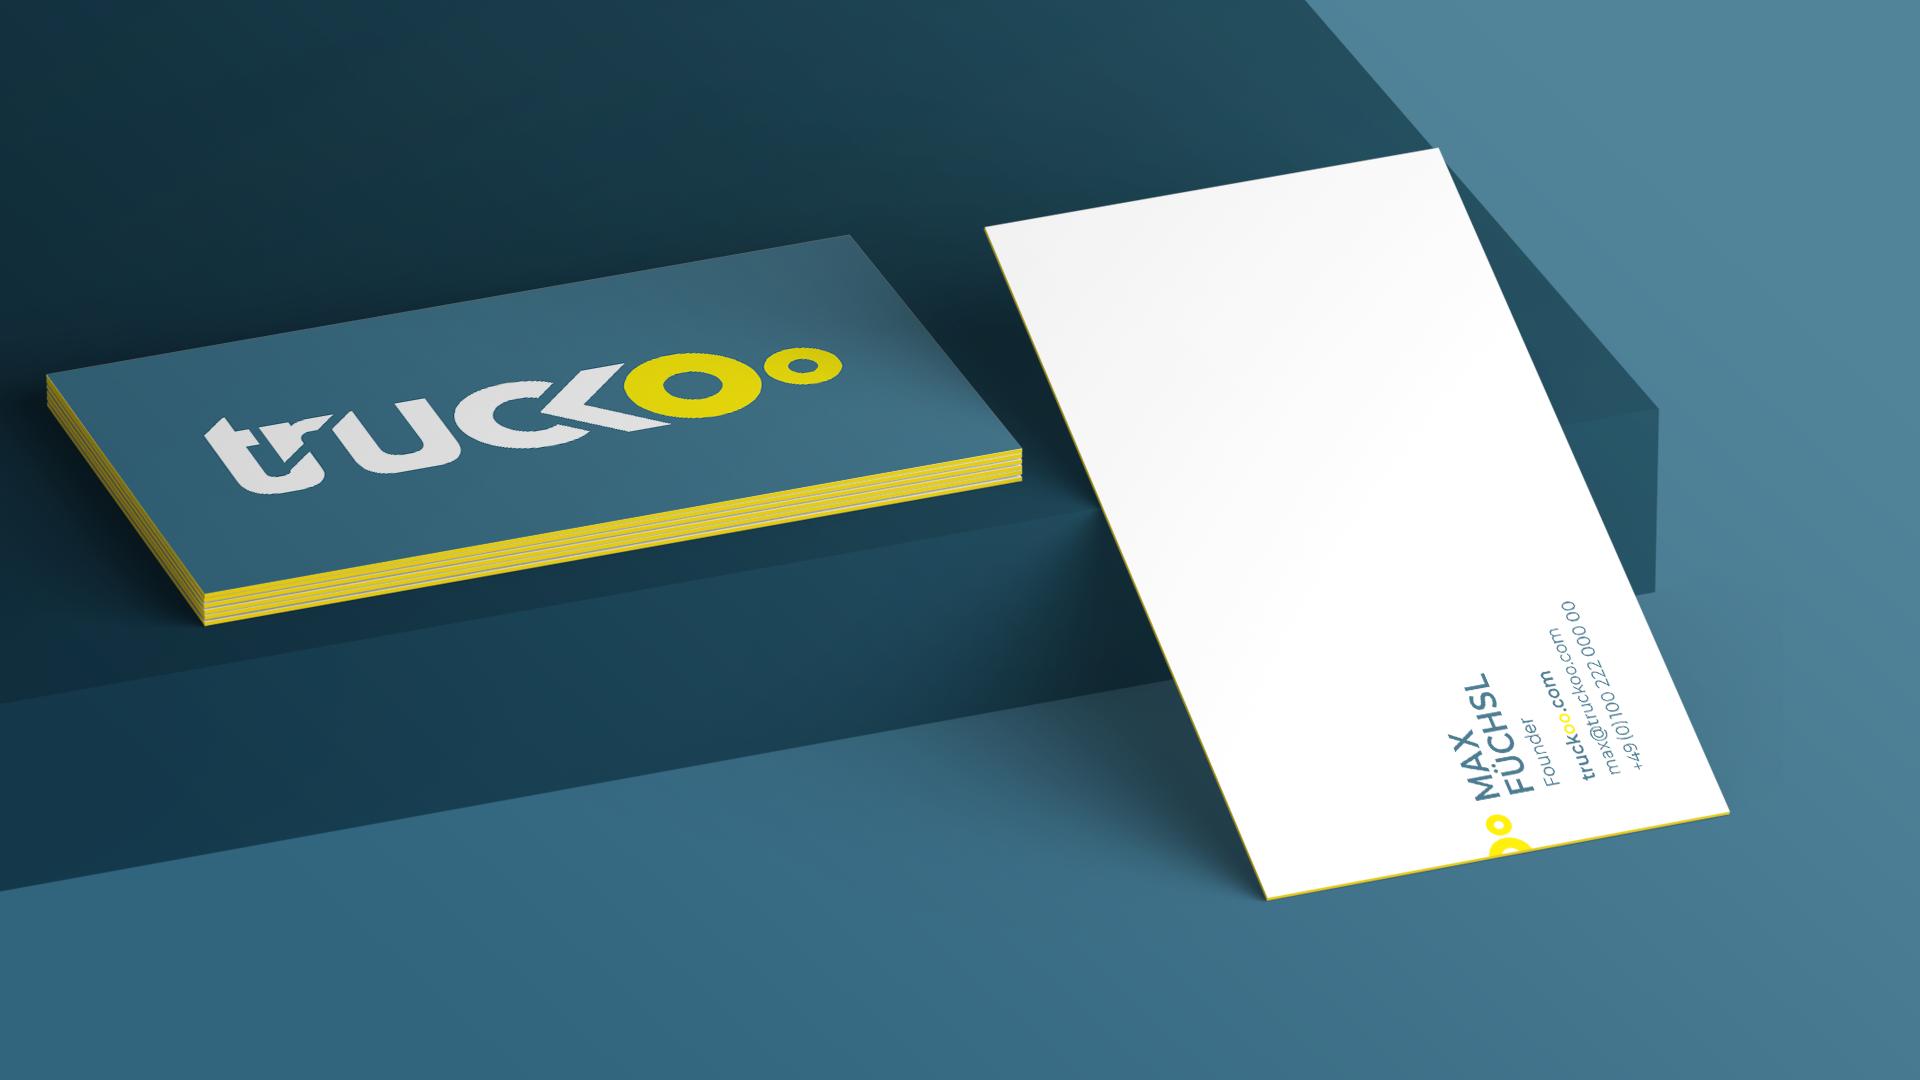 Truckoo_BrandingCase_CD_2019__vcards_1980x1080px